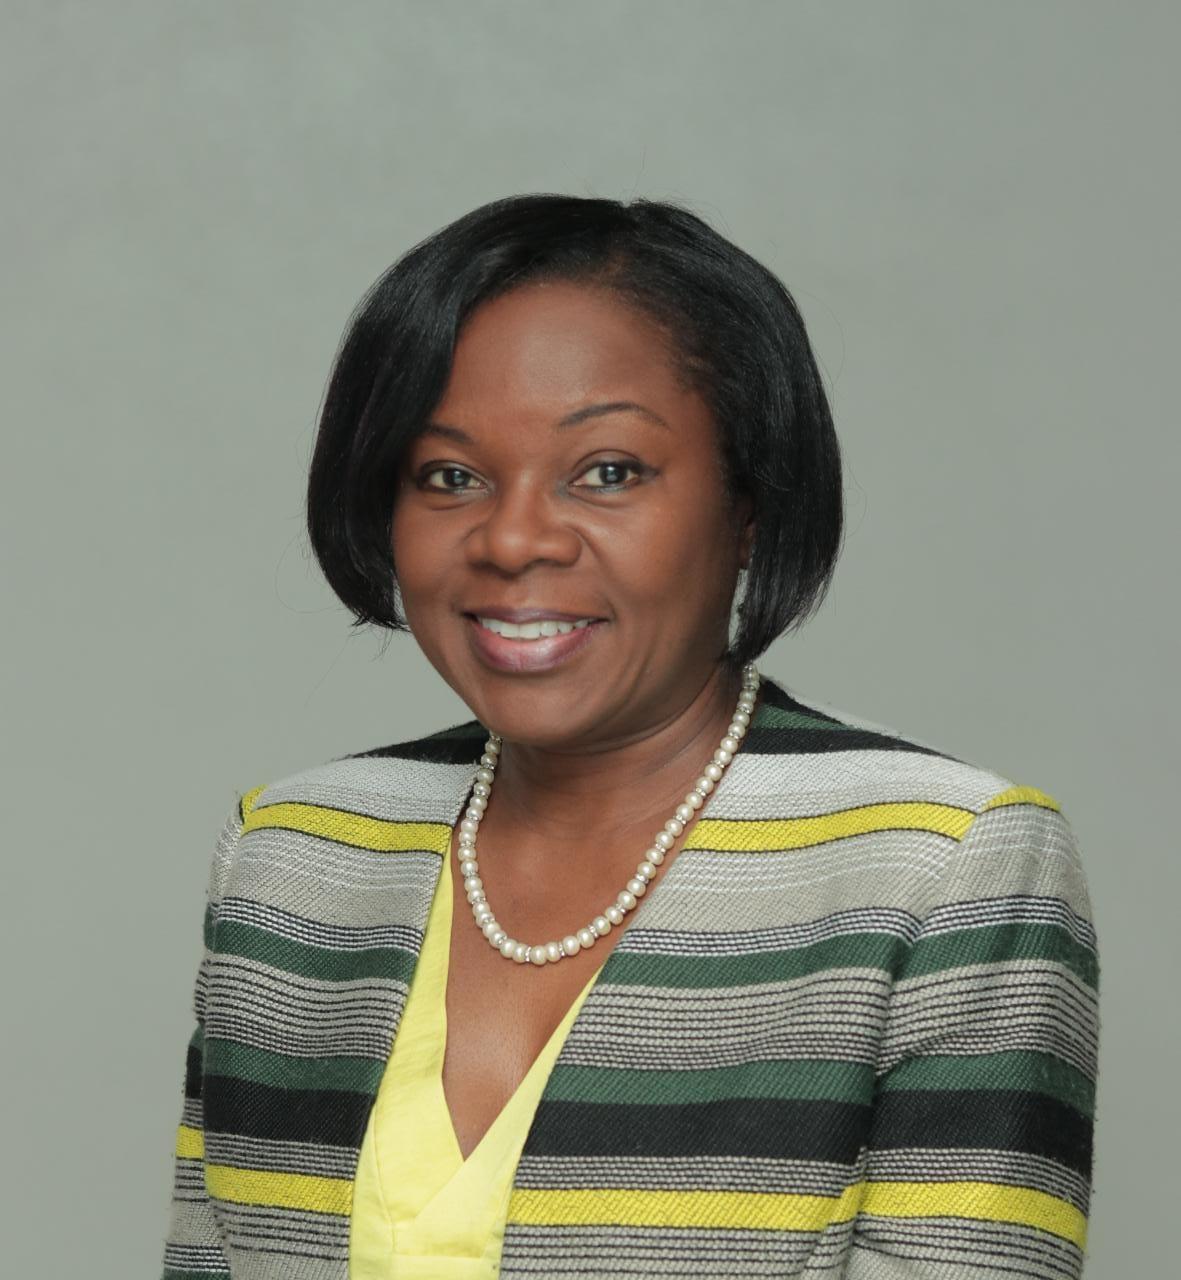 Dr. Karen Gordon-Boyle